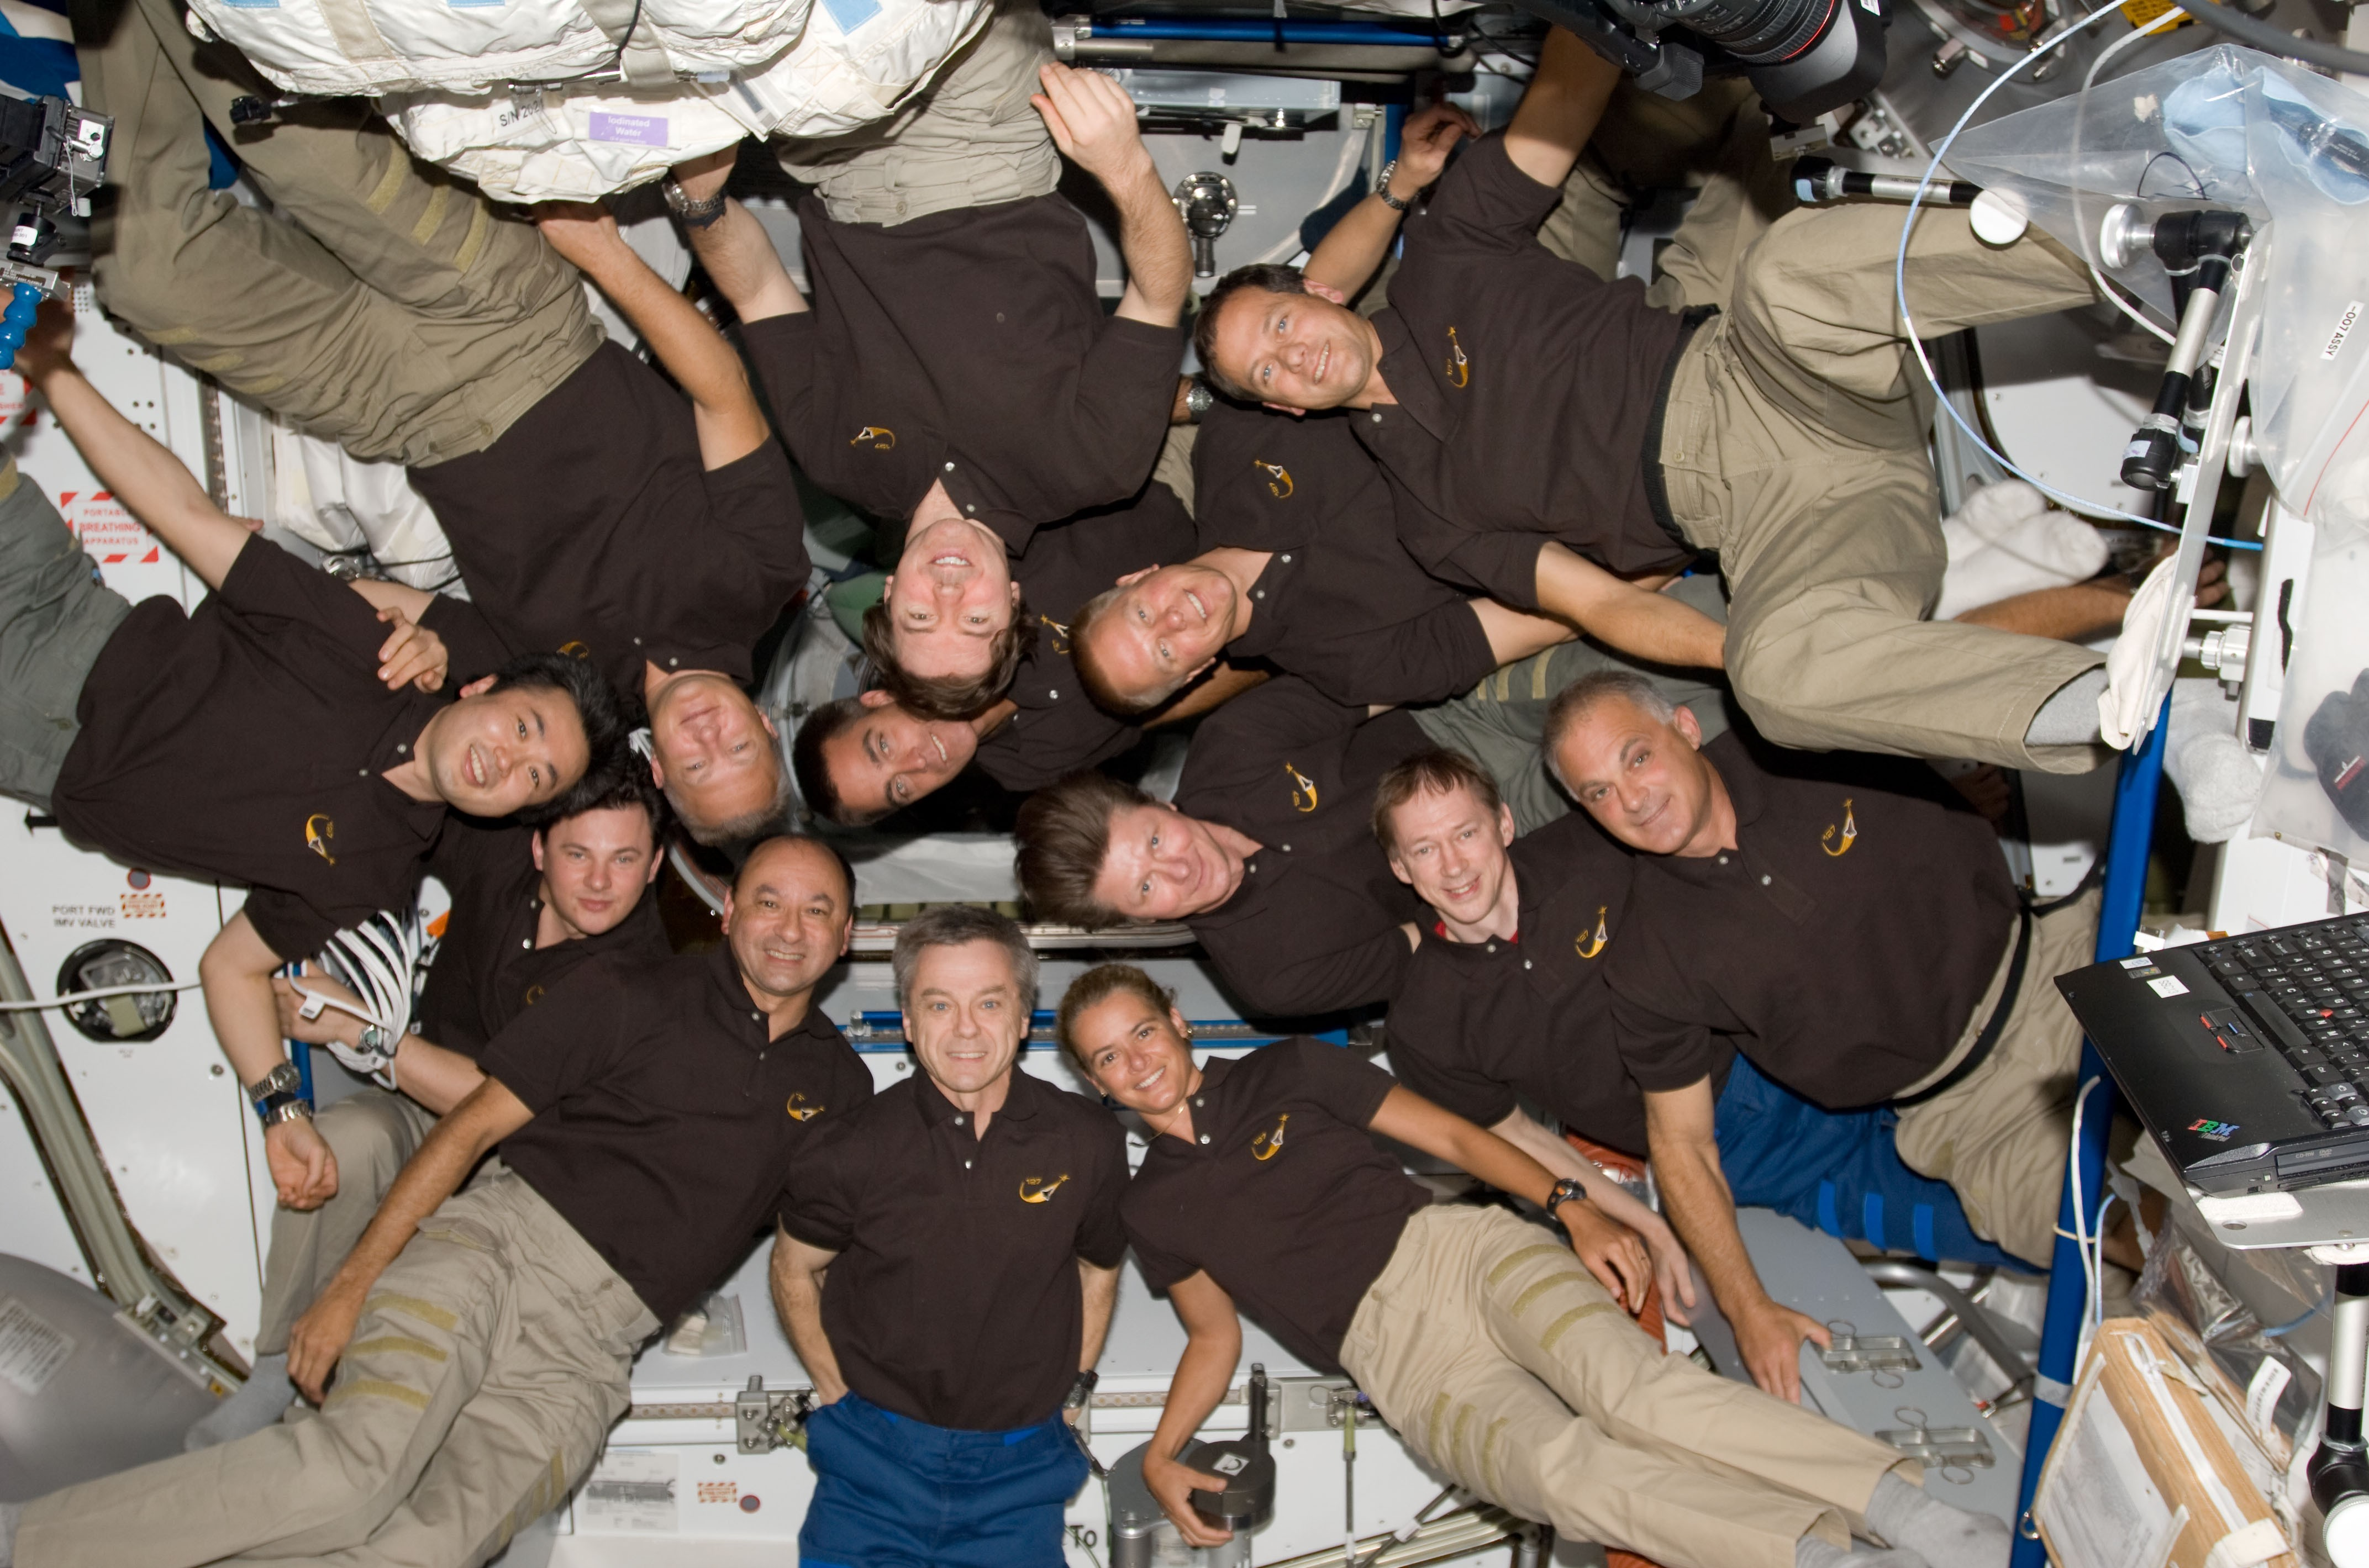 13 человек наборту станции— экипаж МКС ишаттла «Индевор»|| Фото: НАСА